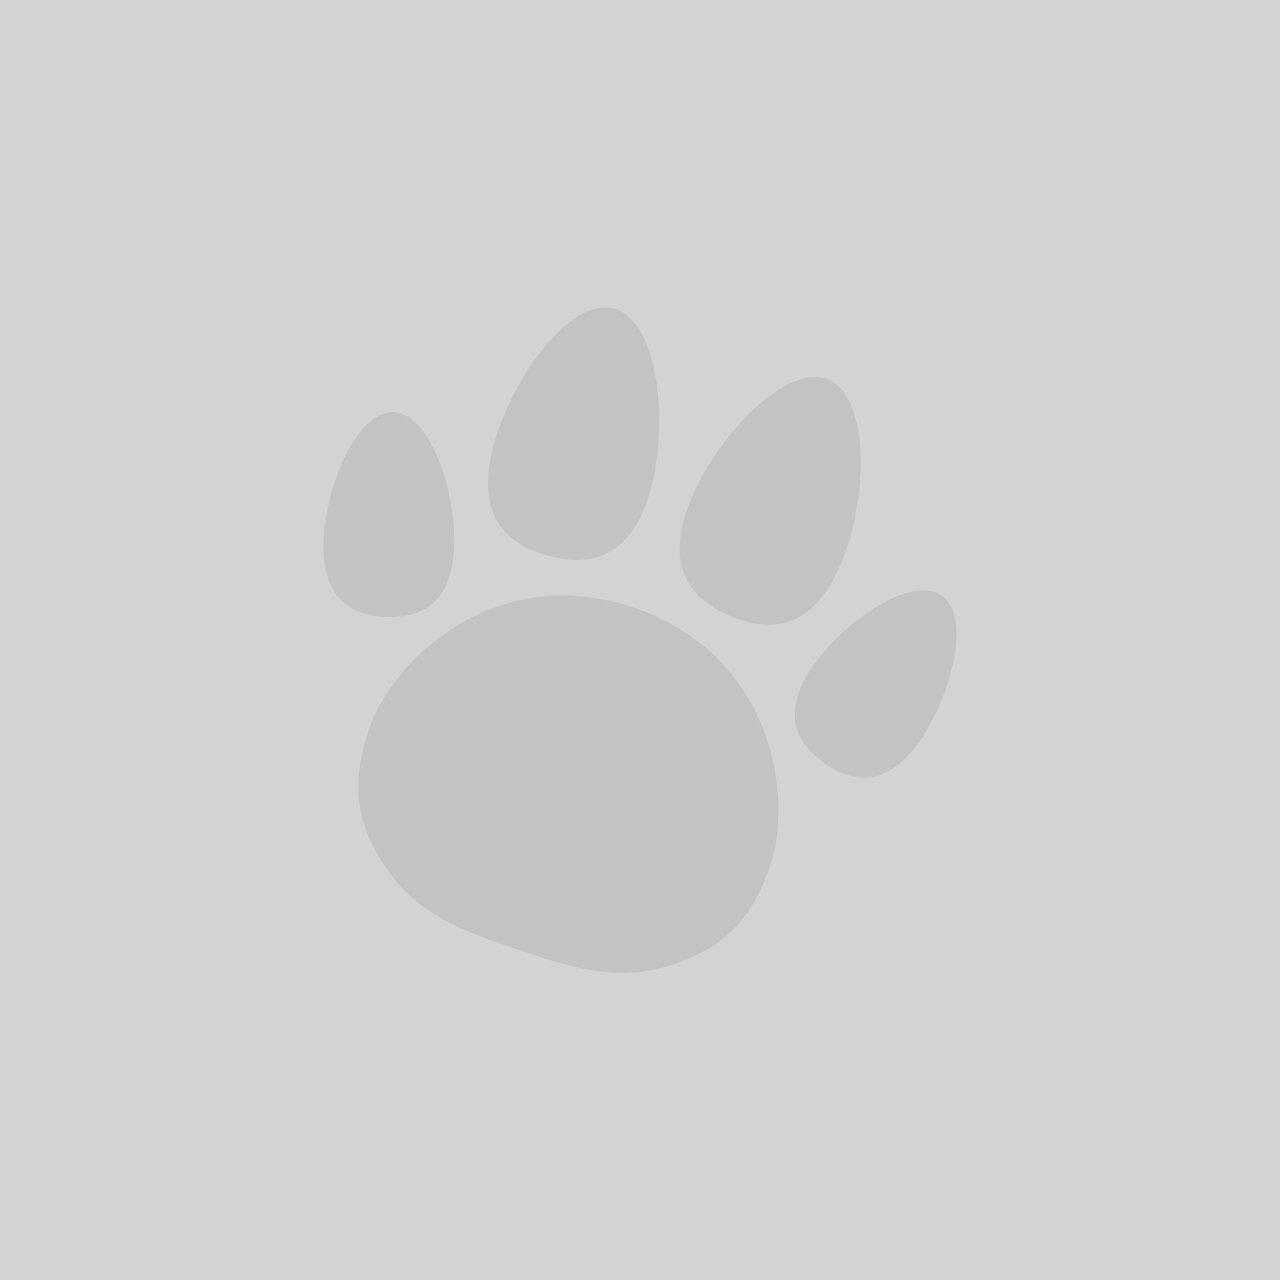 Johnson's Puppy And Kitten Trainer 150ml